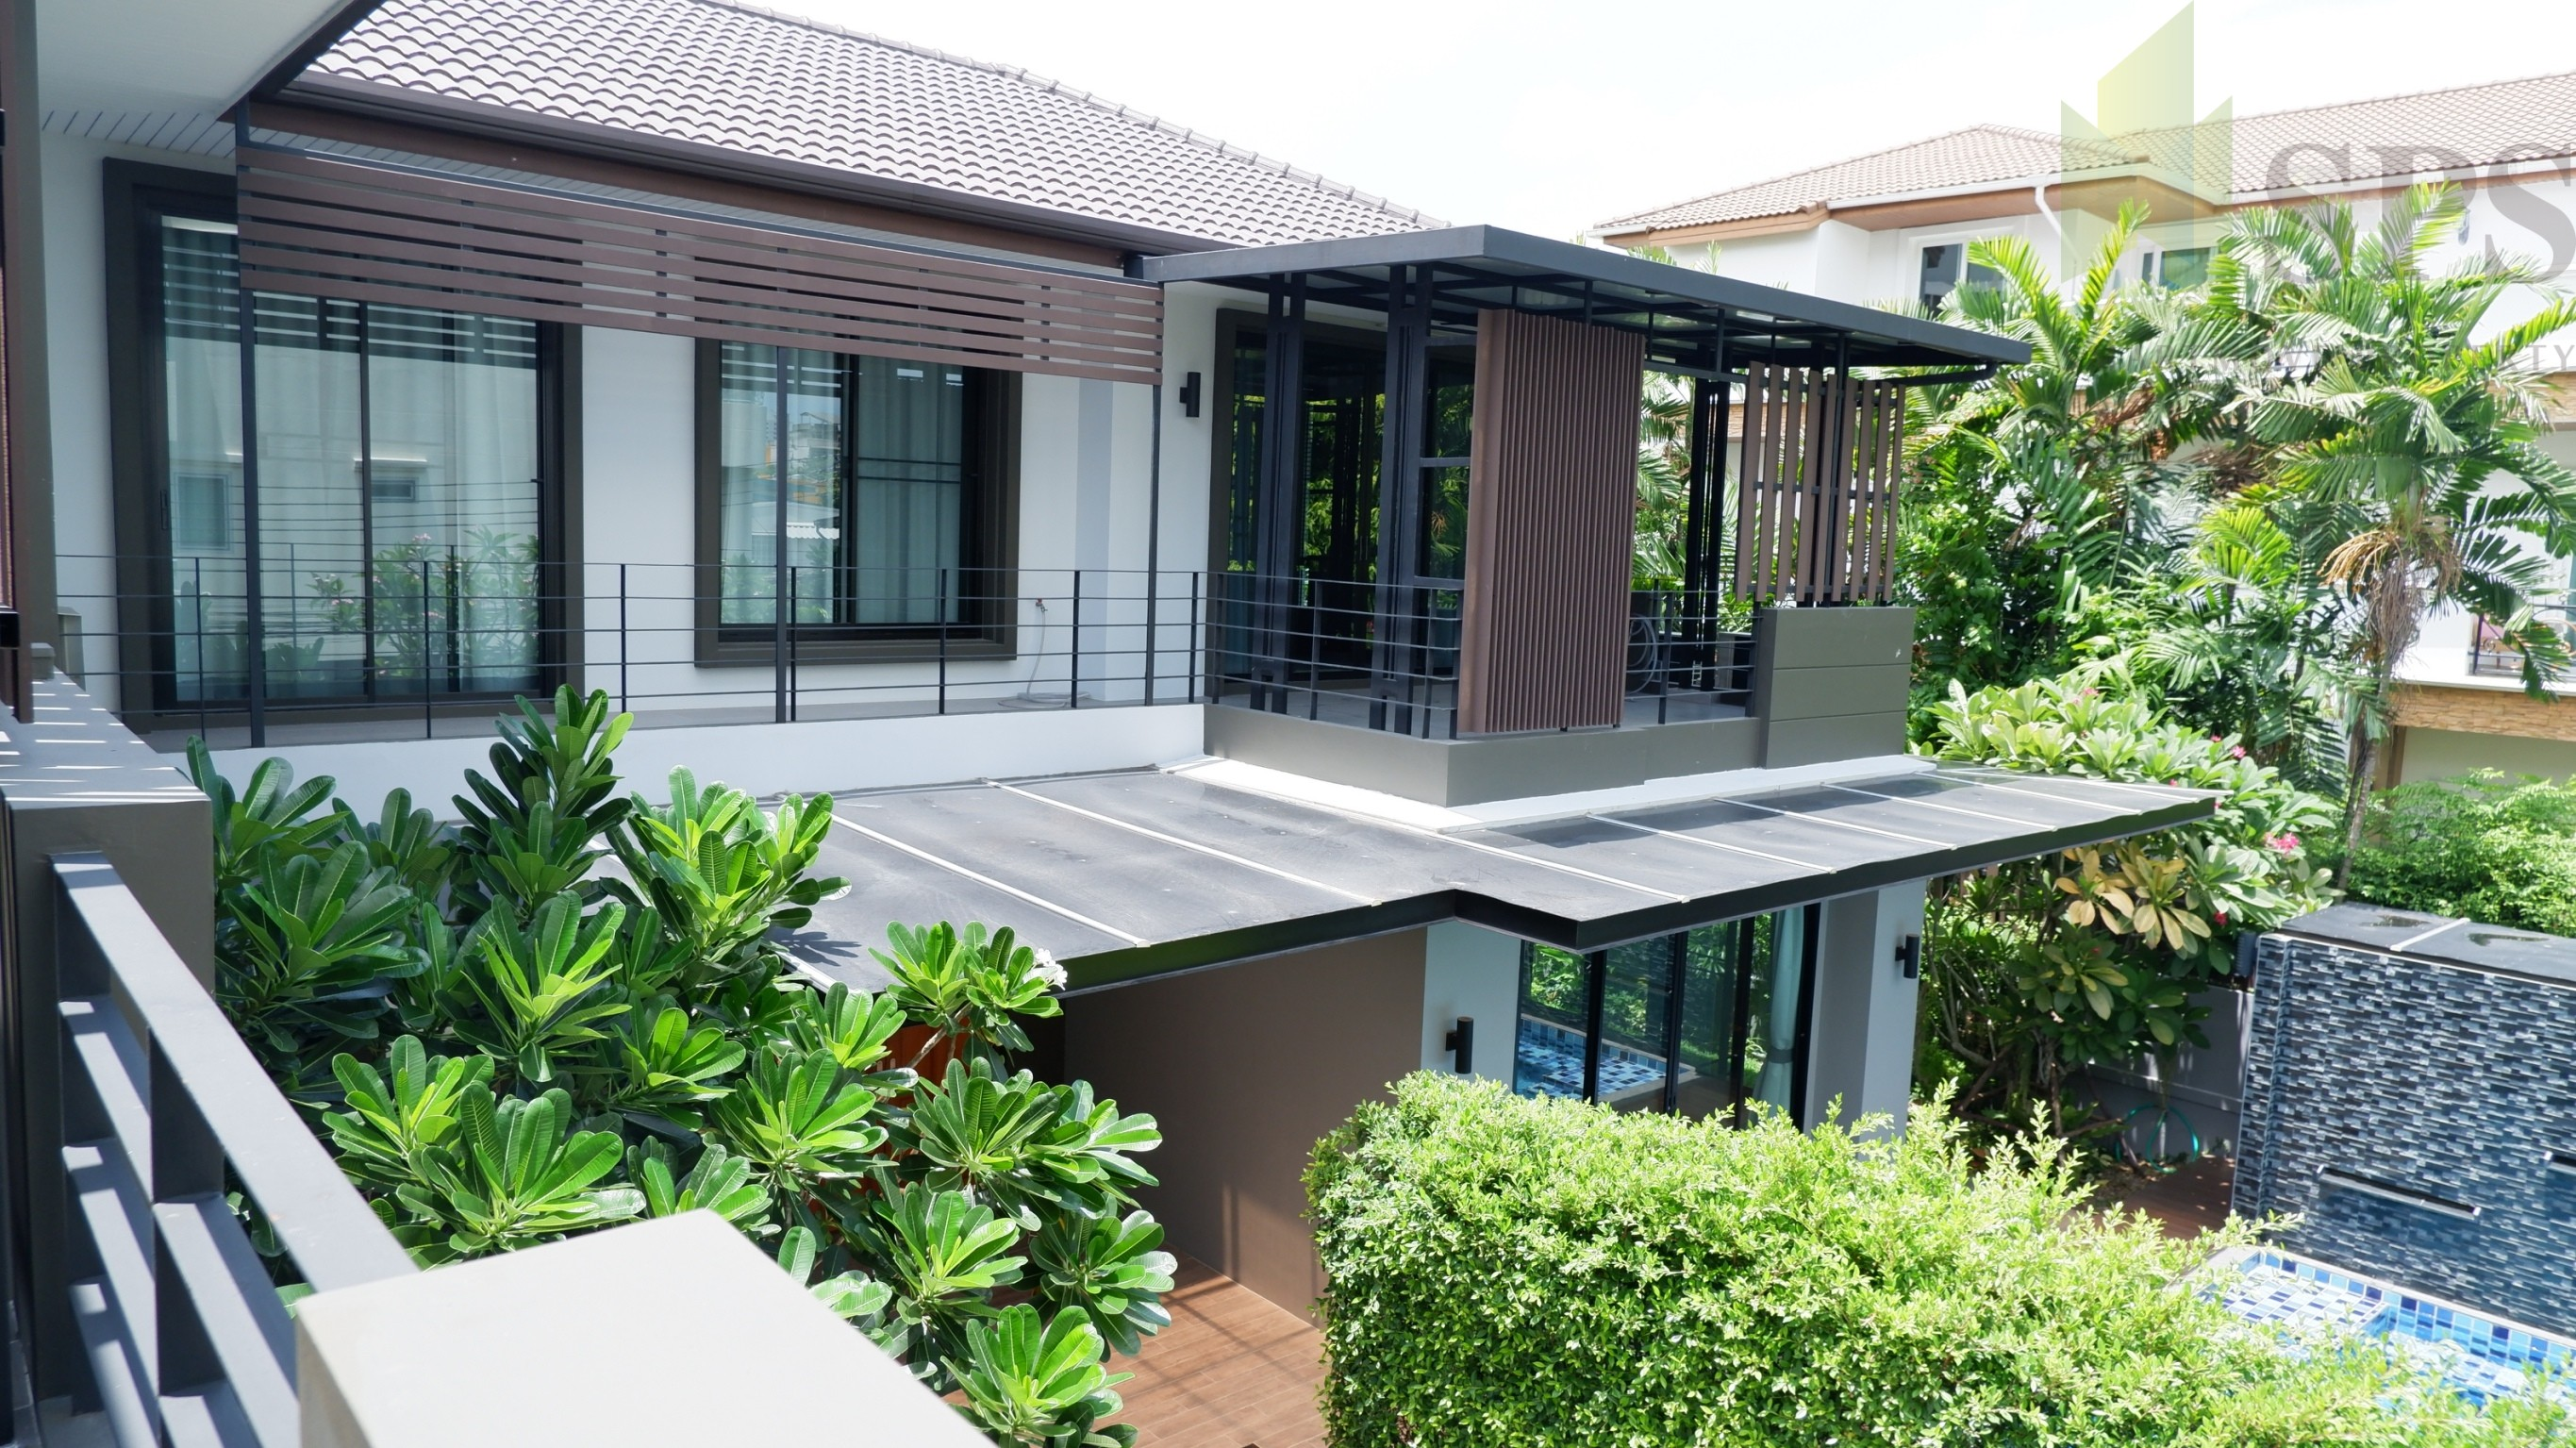 Sale Single house 4 beds Sukhumvit 71 newly renovated (SPS-PP130)